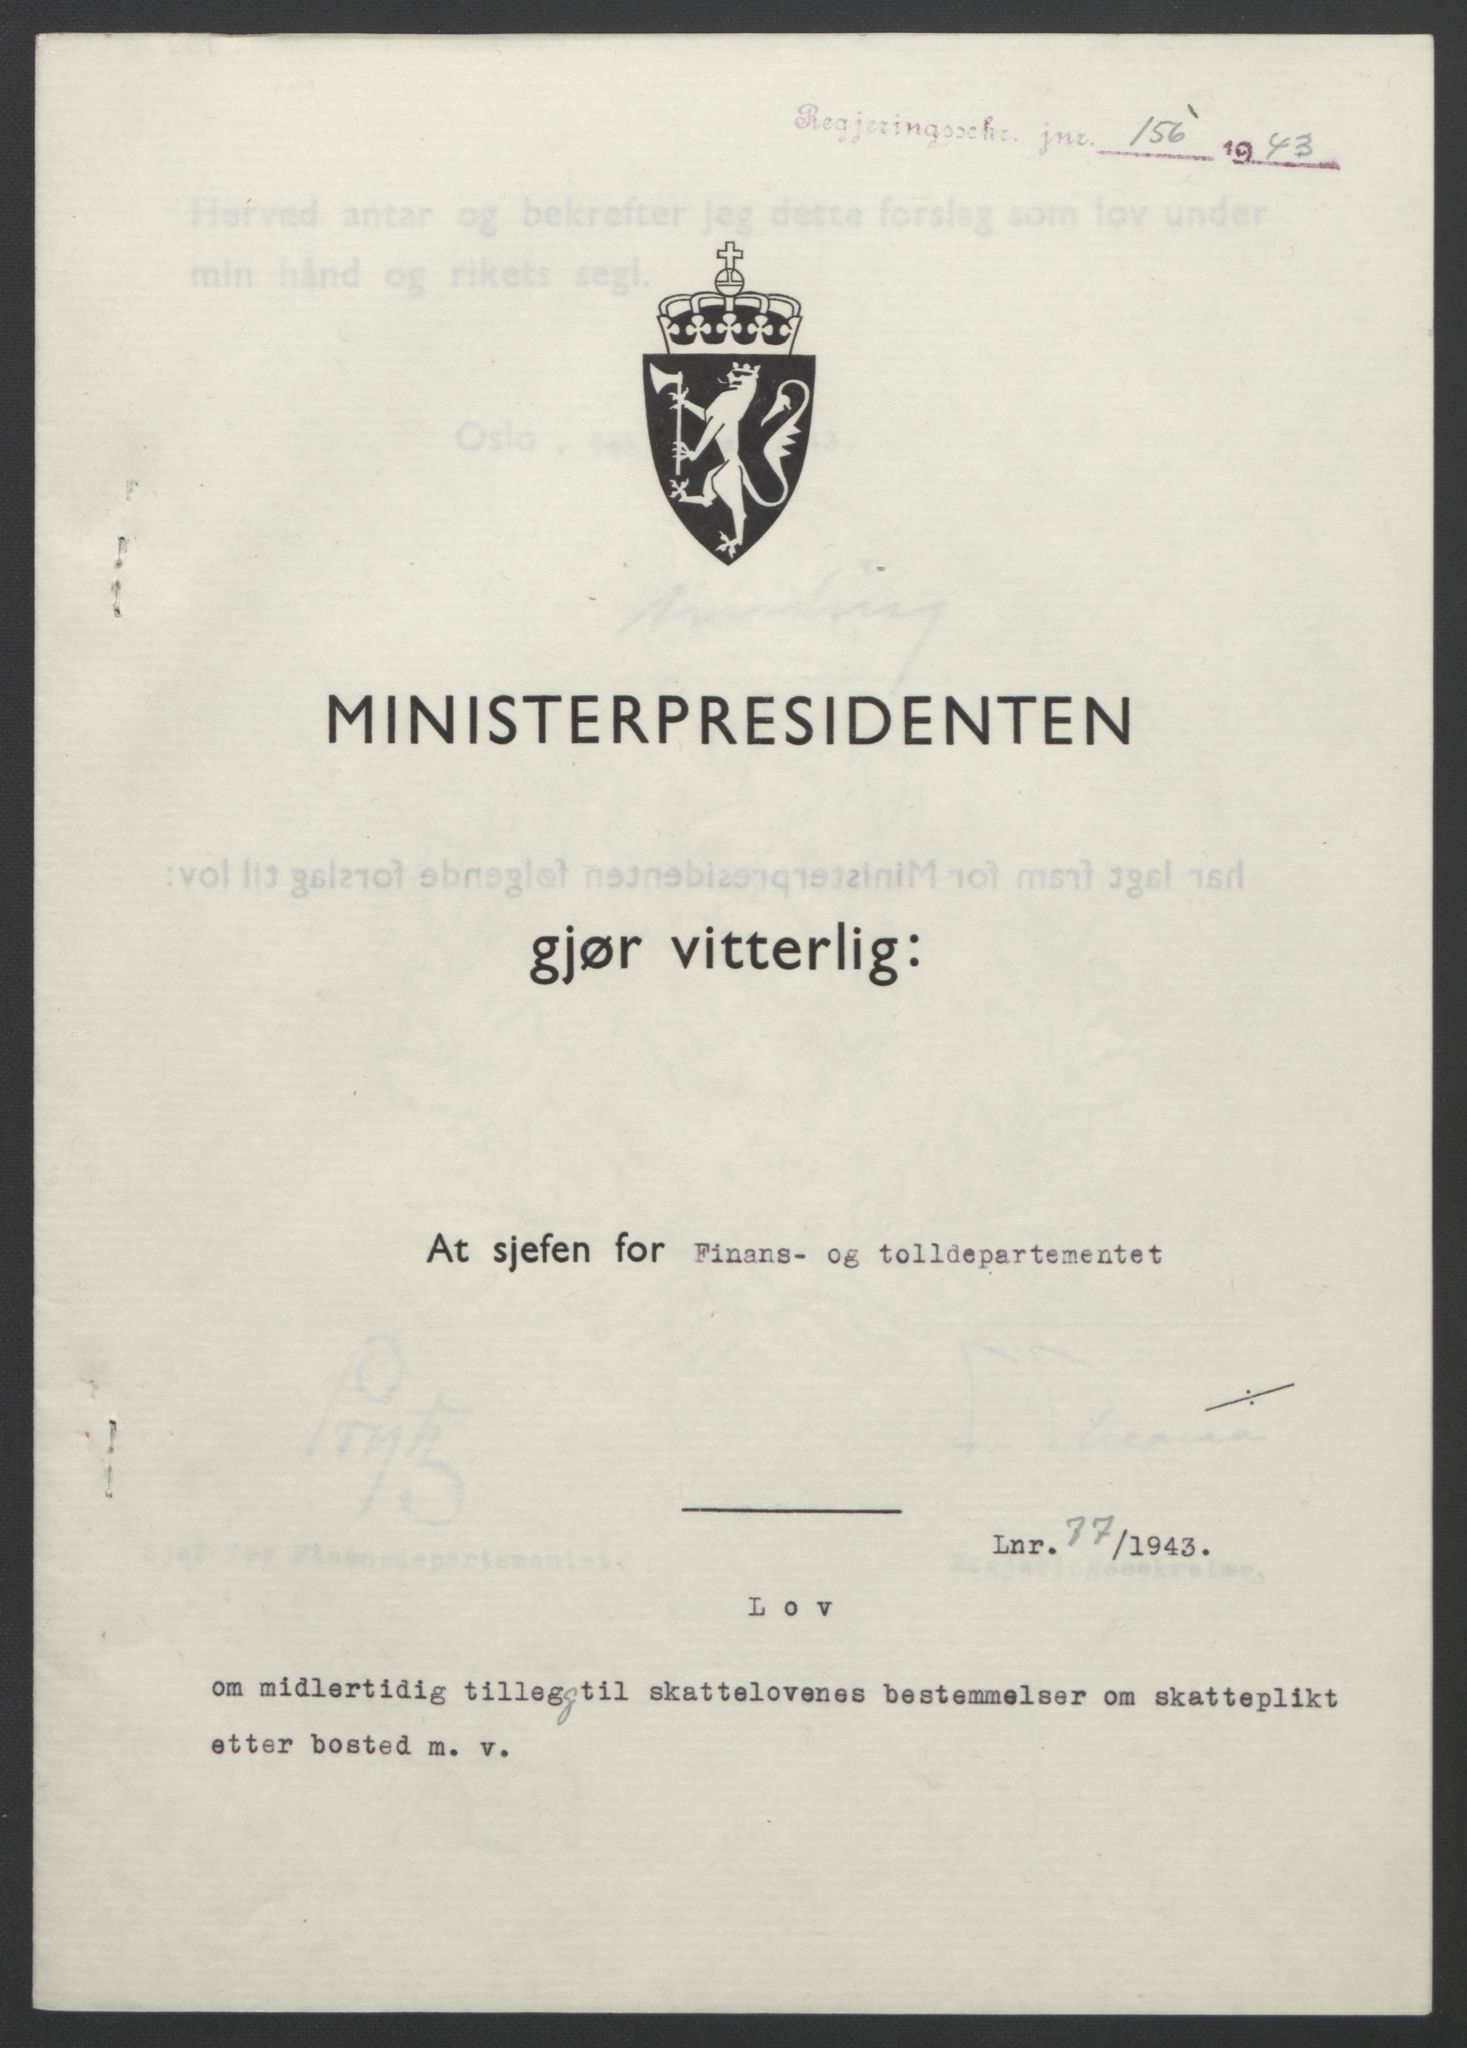 RA, NS-administrasjonen 1940-1945 (Statsrådsekretariatet, de kommisariske statsråder mm), D/Db/L0099: Lover, 1943, s. 353